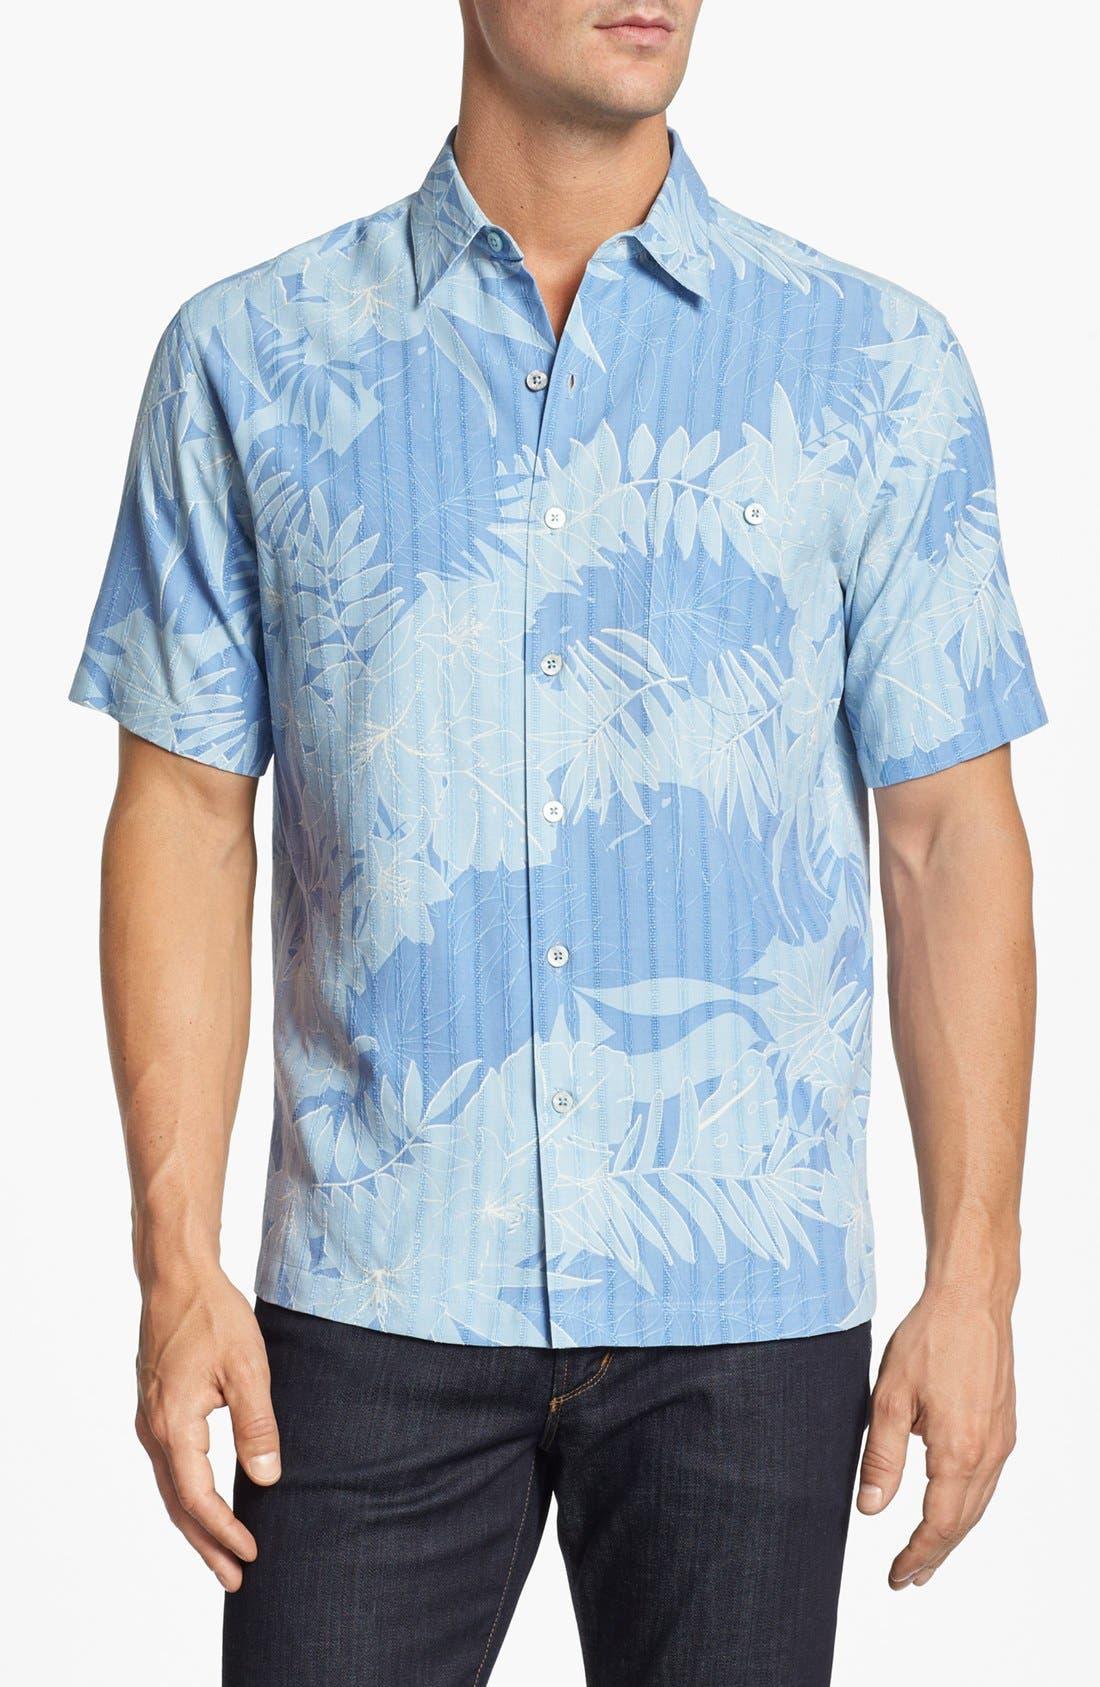 Main Image - Tori Richard 'Reflection' Short Sleeve Sport Shirt